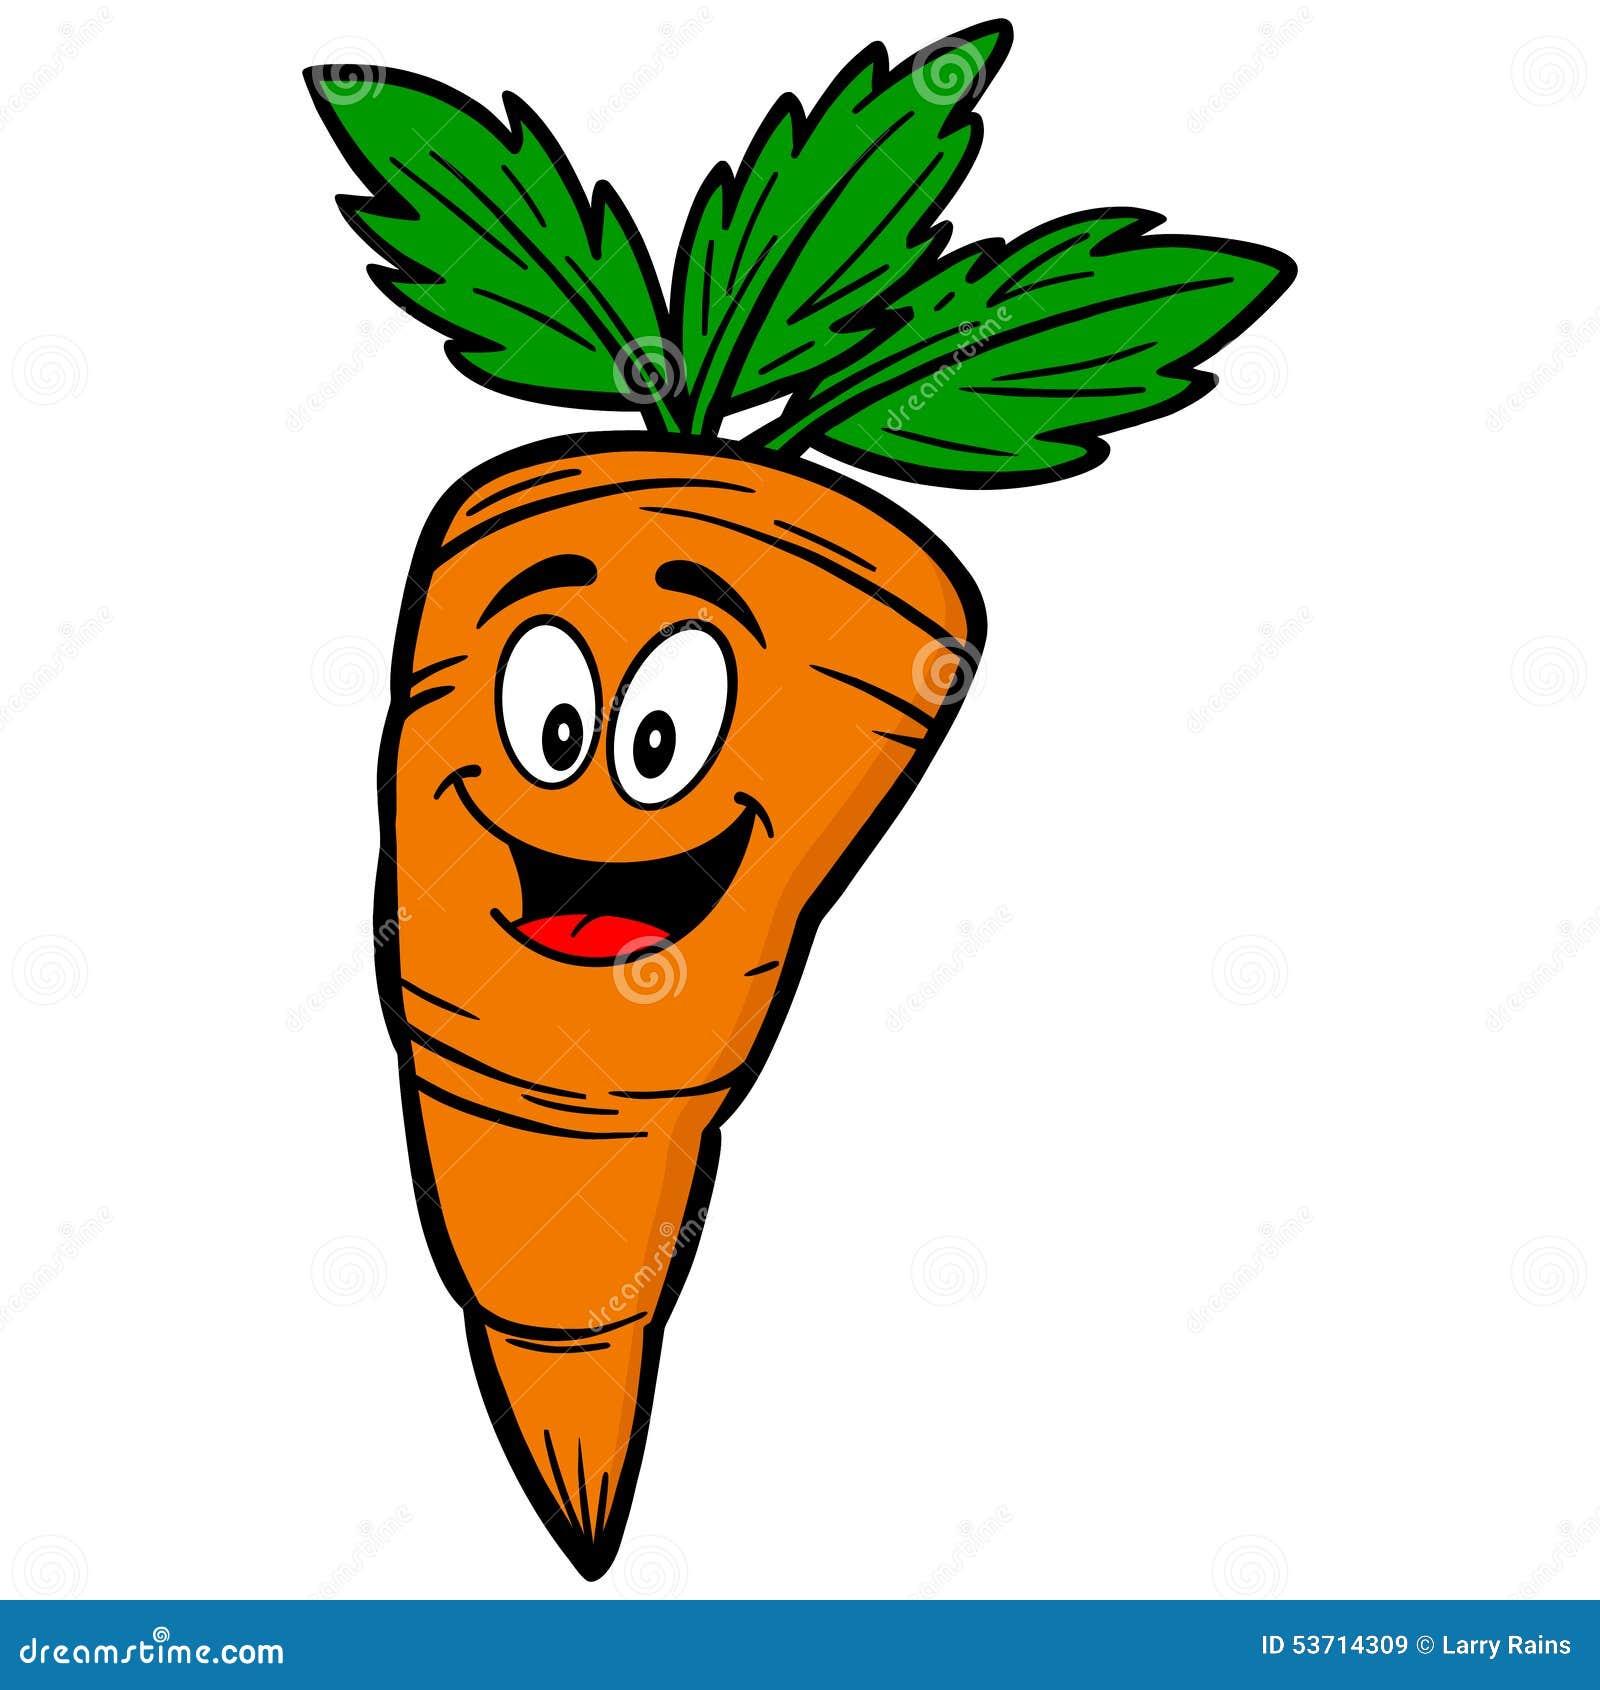 Stock Illustration Carrot Cartoon Mascot Illustration Image53714309 on Food To Sell